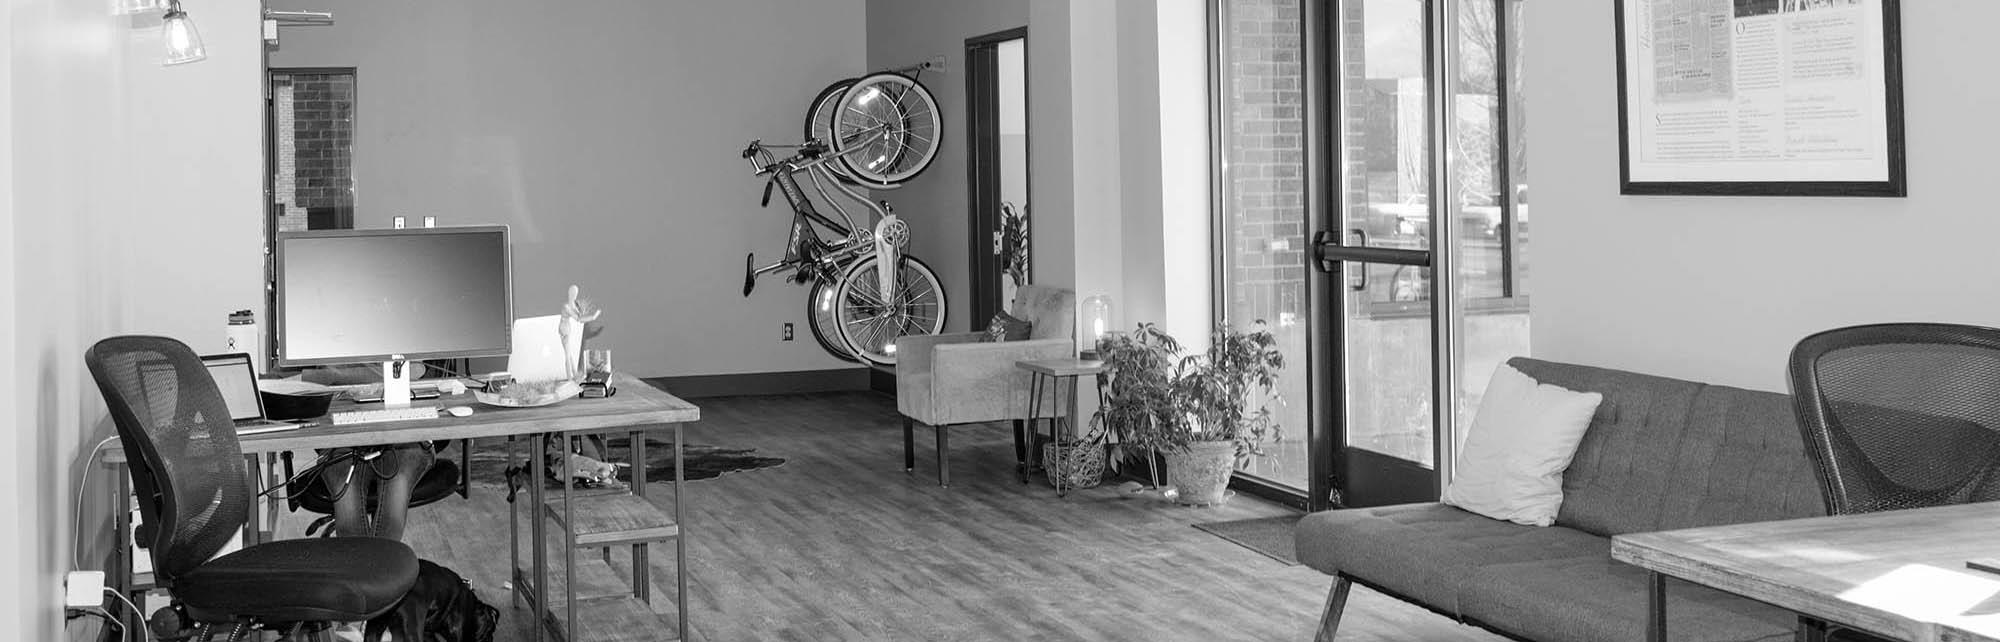 new savy office interior